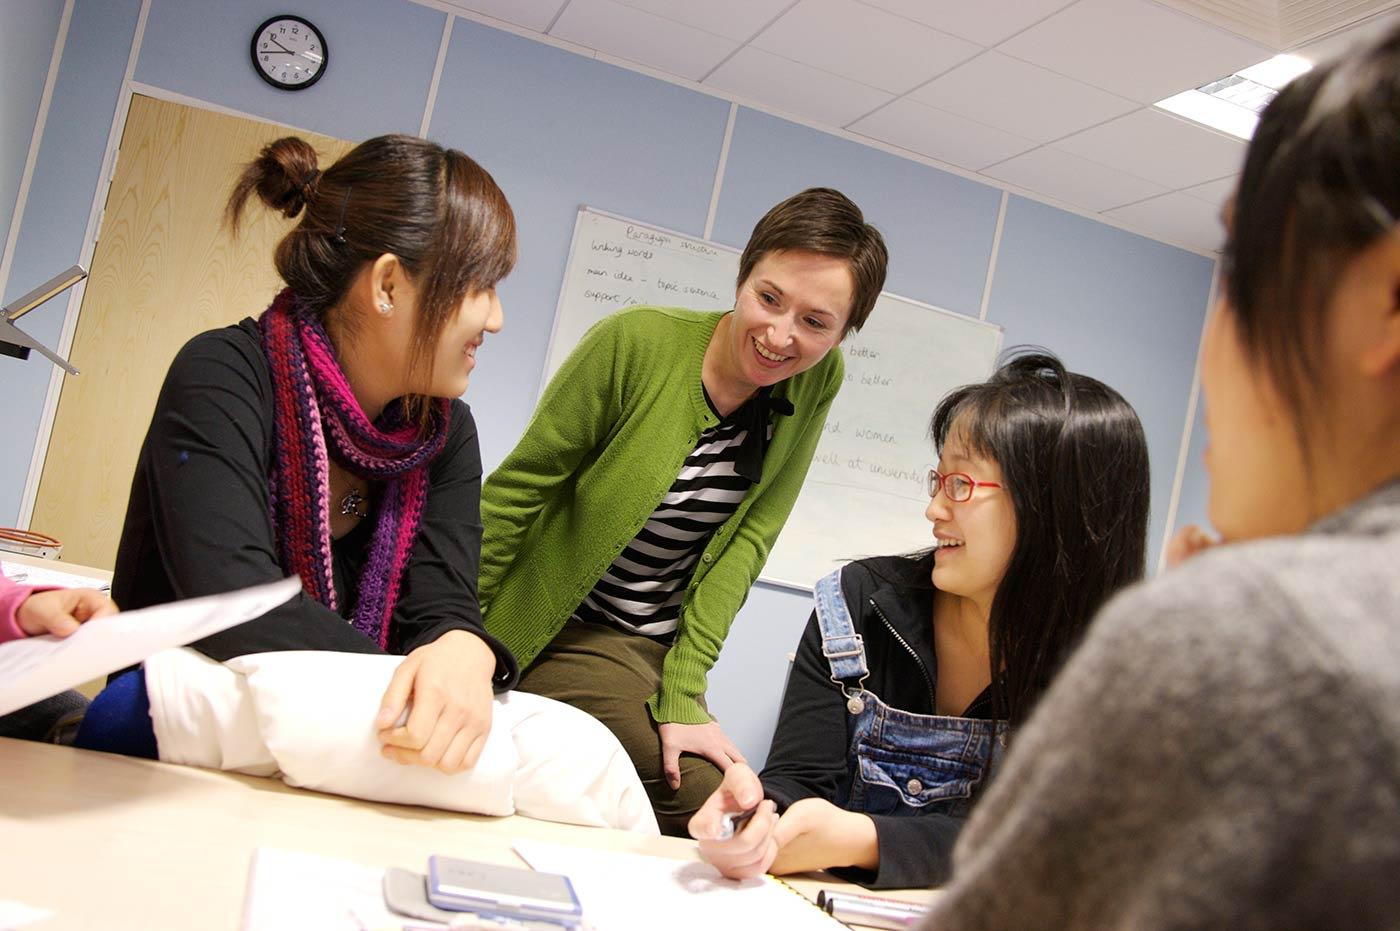 An average 1:9 student to teacher ratio